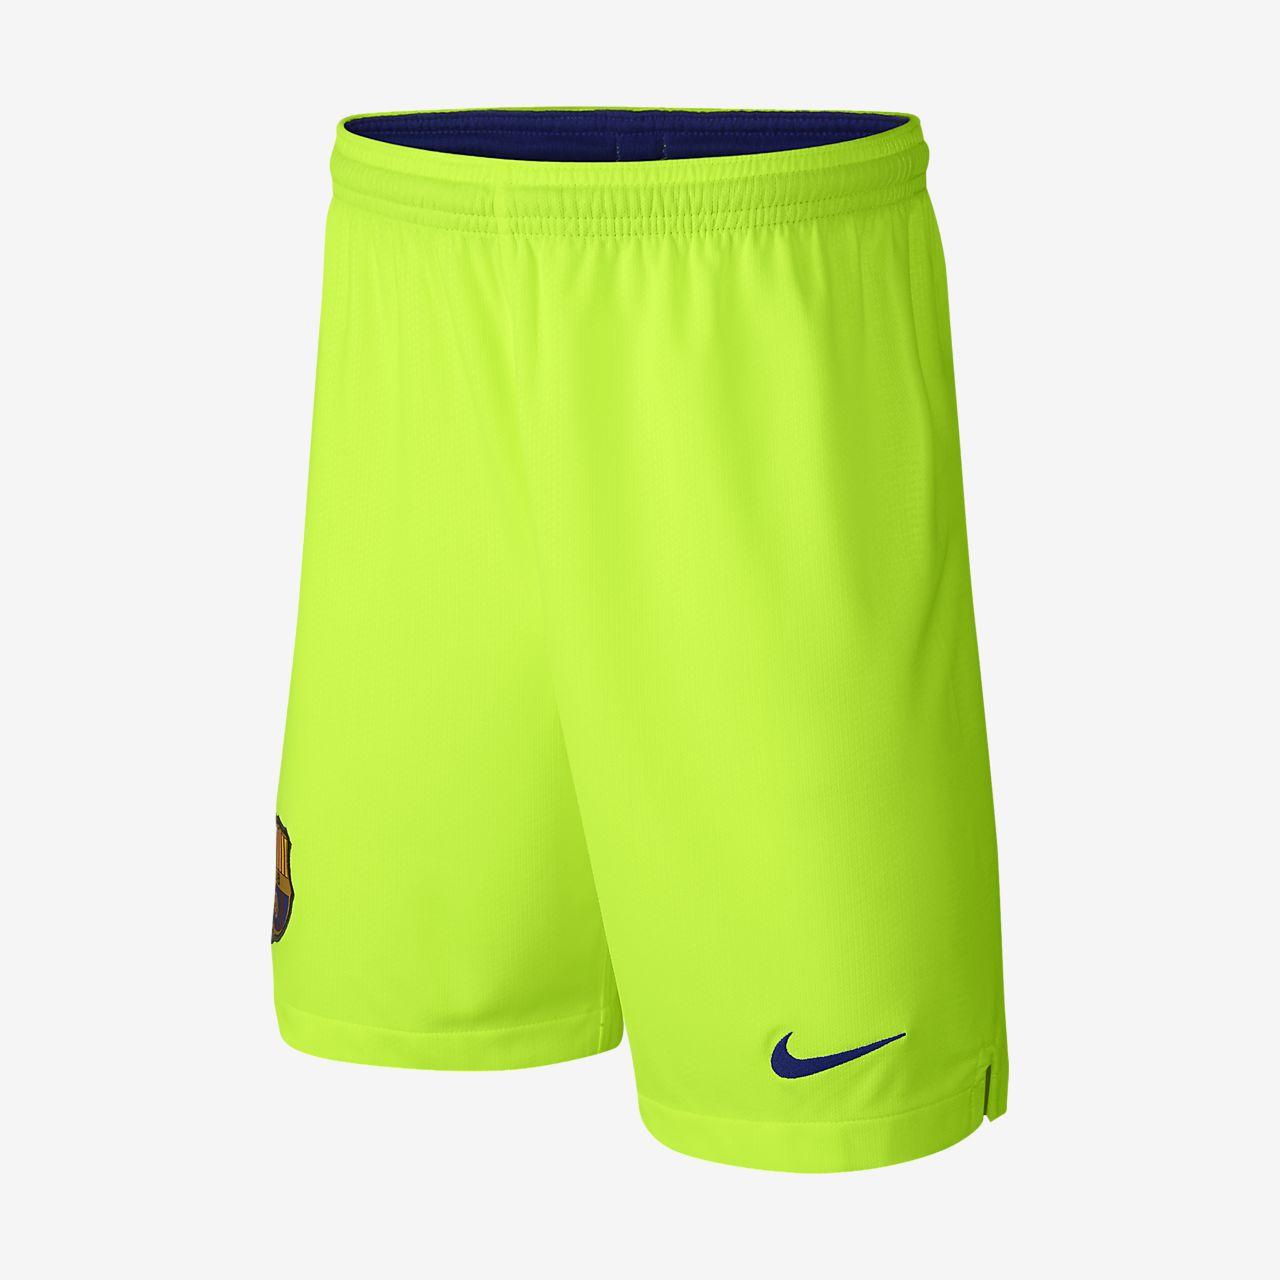 a8e343102e 2018 19 FC Barcelona Stadium Away Older Kids  Football Shorts. Nike ...